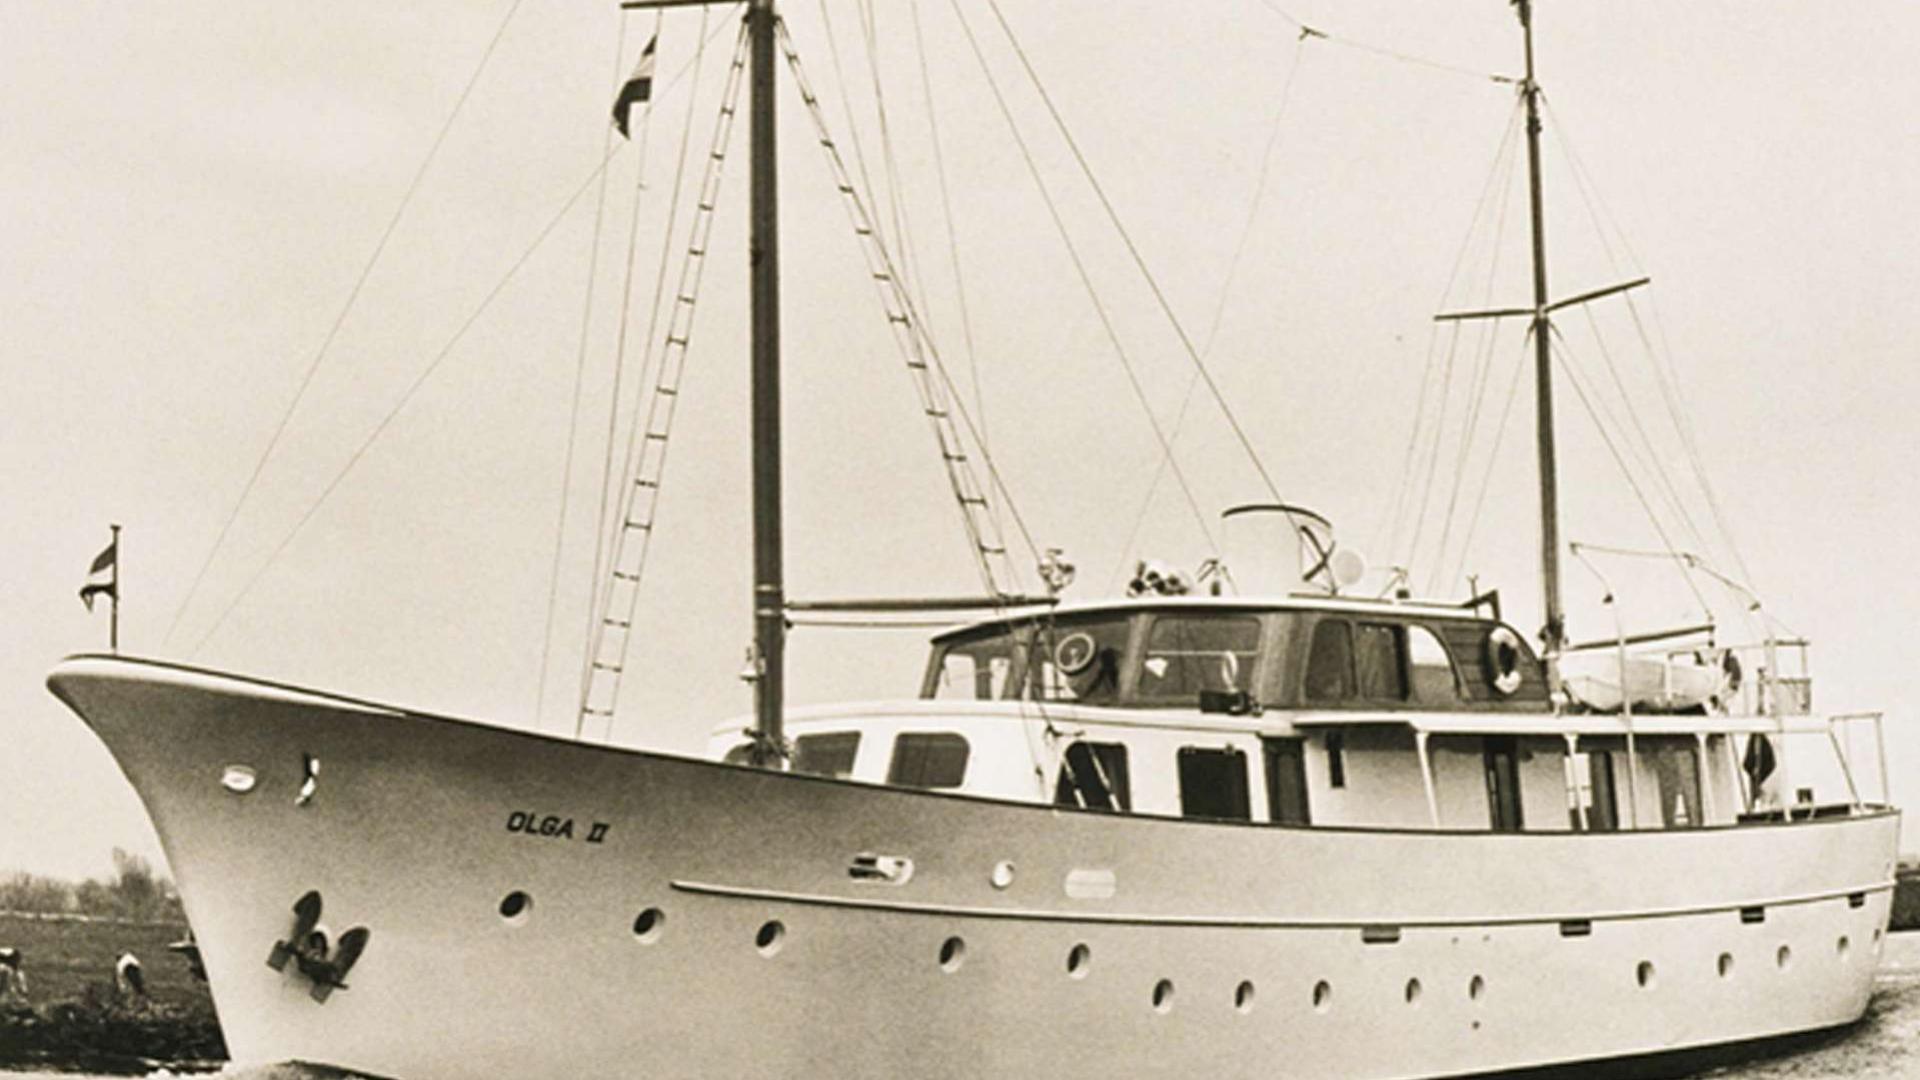 leonardo-sailing-yacht-feadship-1953-31m-front-profile